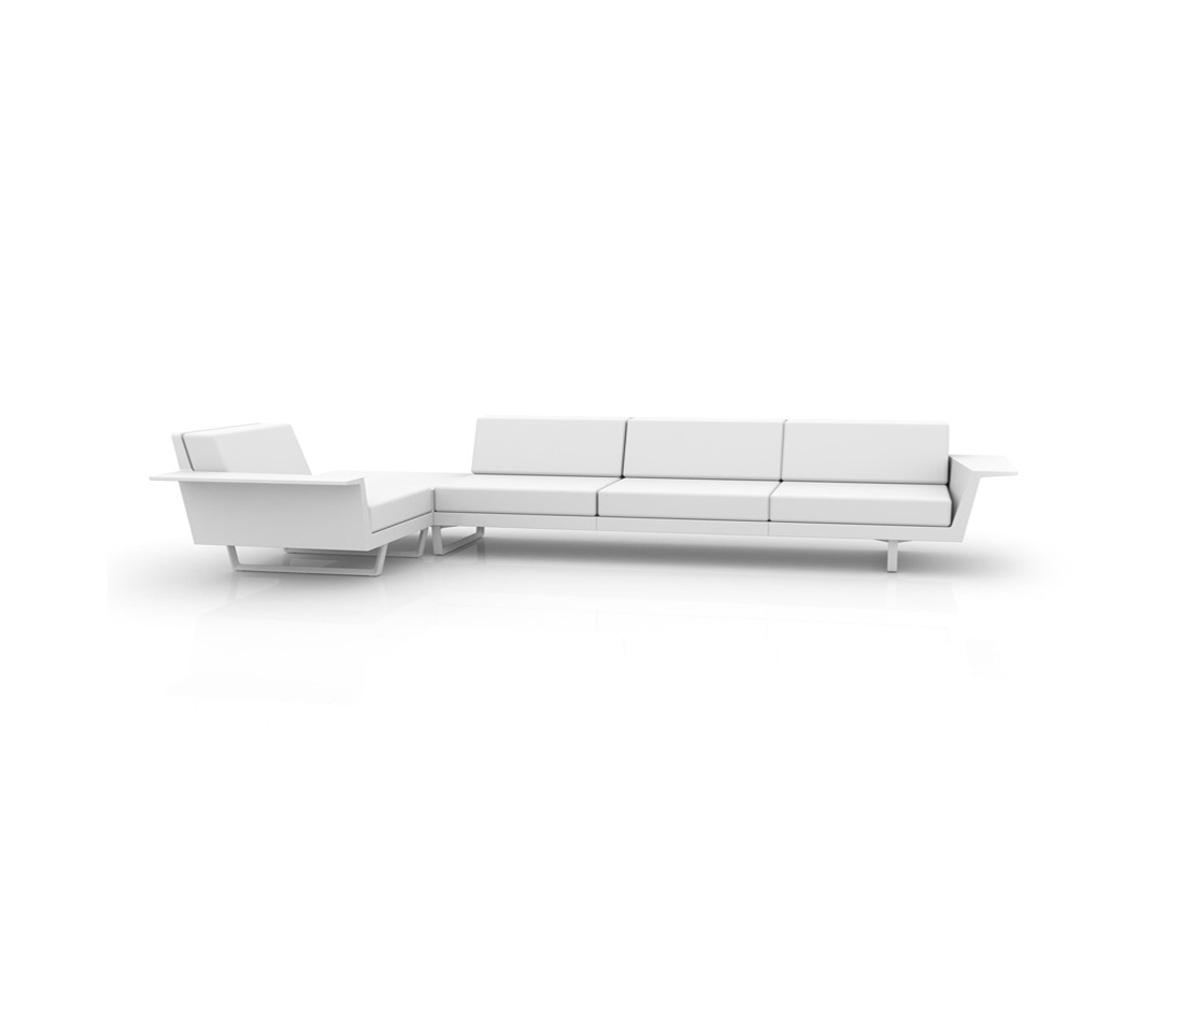 delta-corner-right-4-seat-sofa-by-vondom